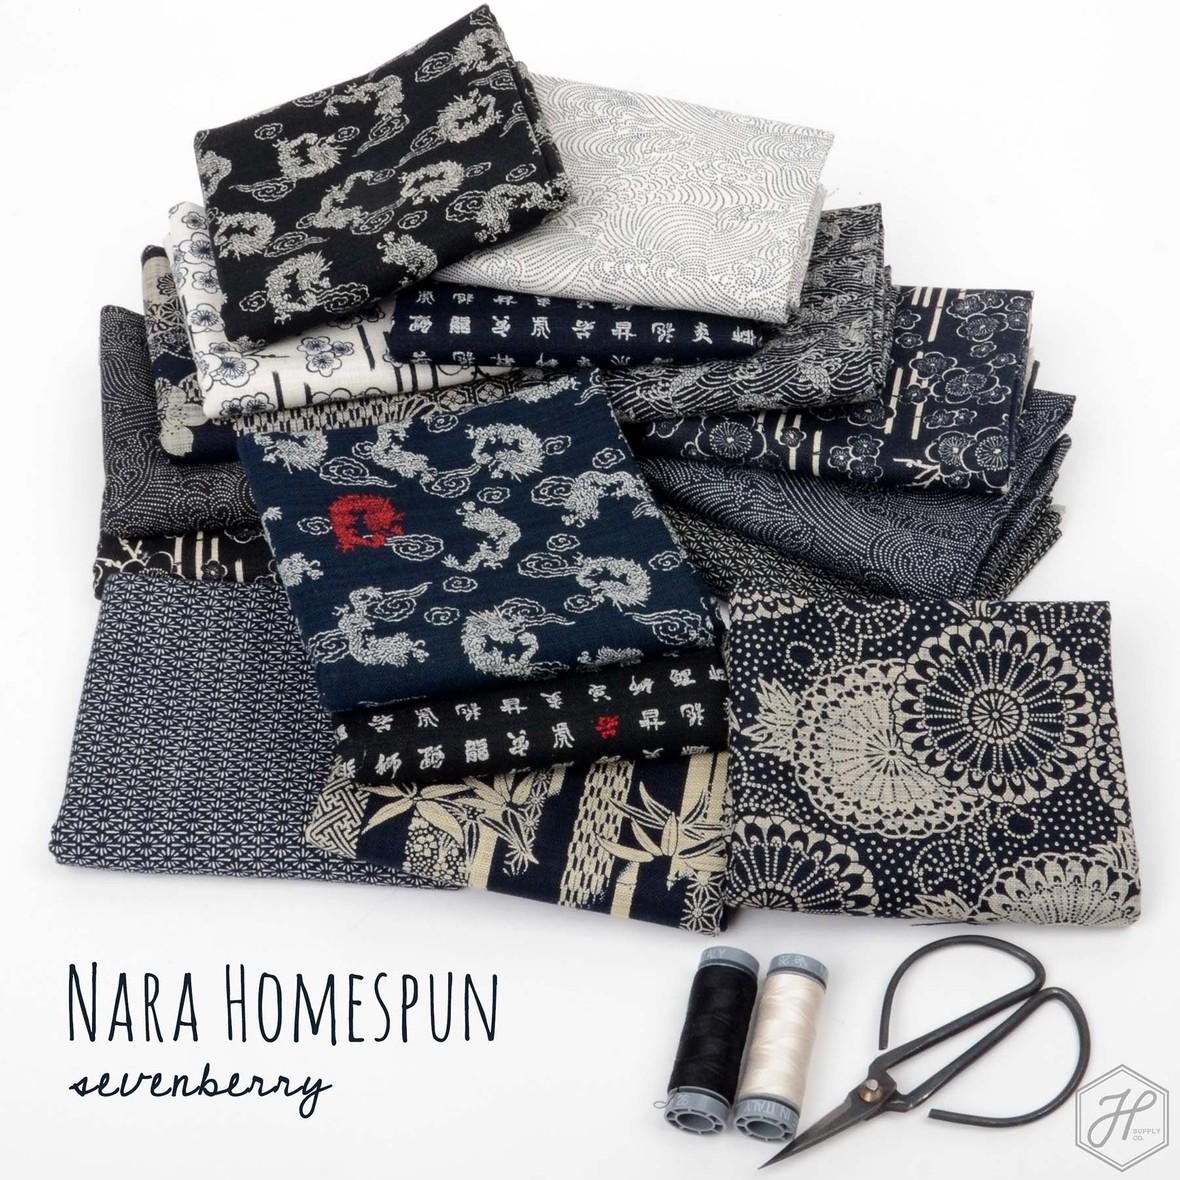 Nara Homespun 2 Sevenberry Fabric Poster Hawthorne Supply Co